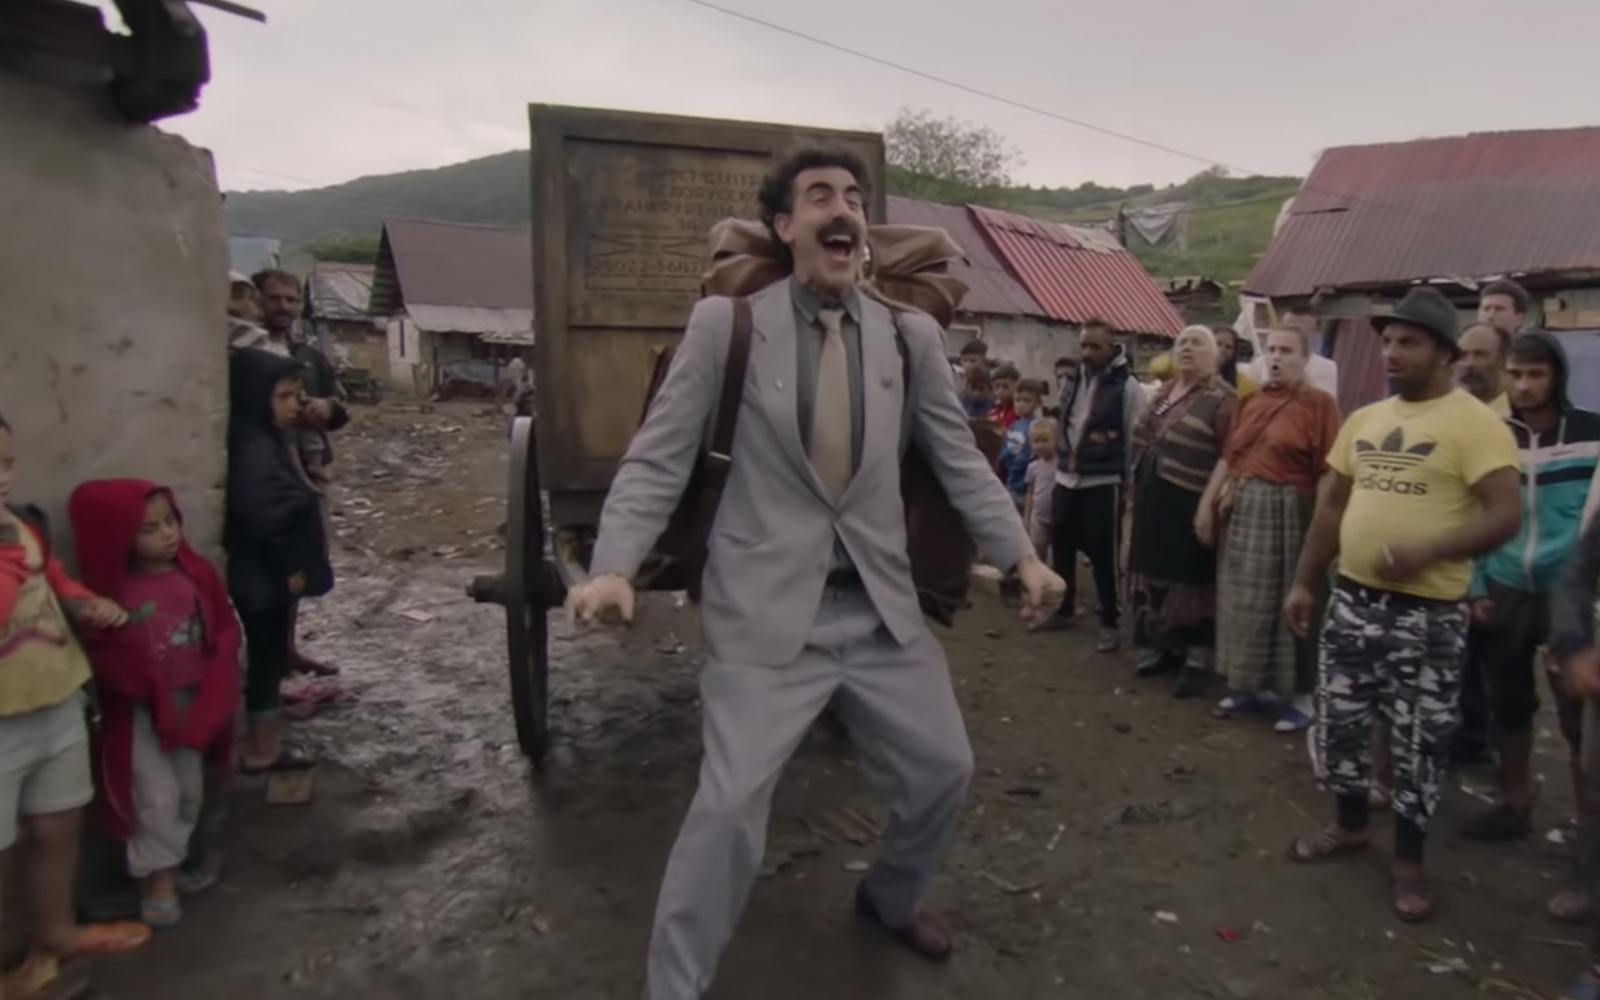 Borat congratulates Donald Trump's debate performance in video message